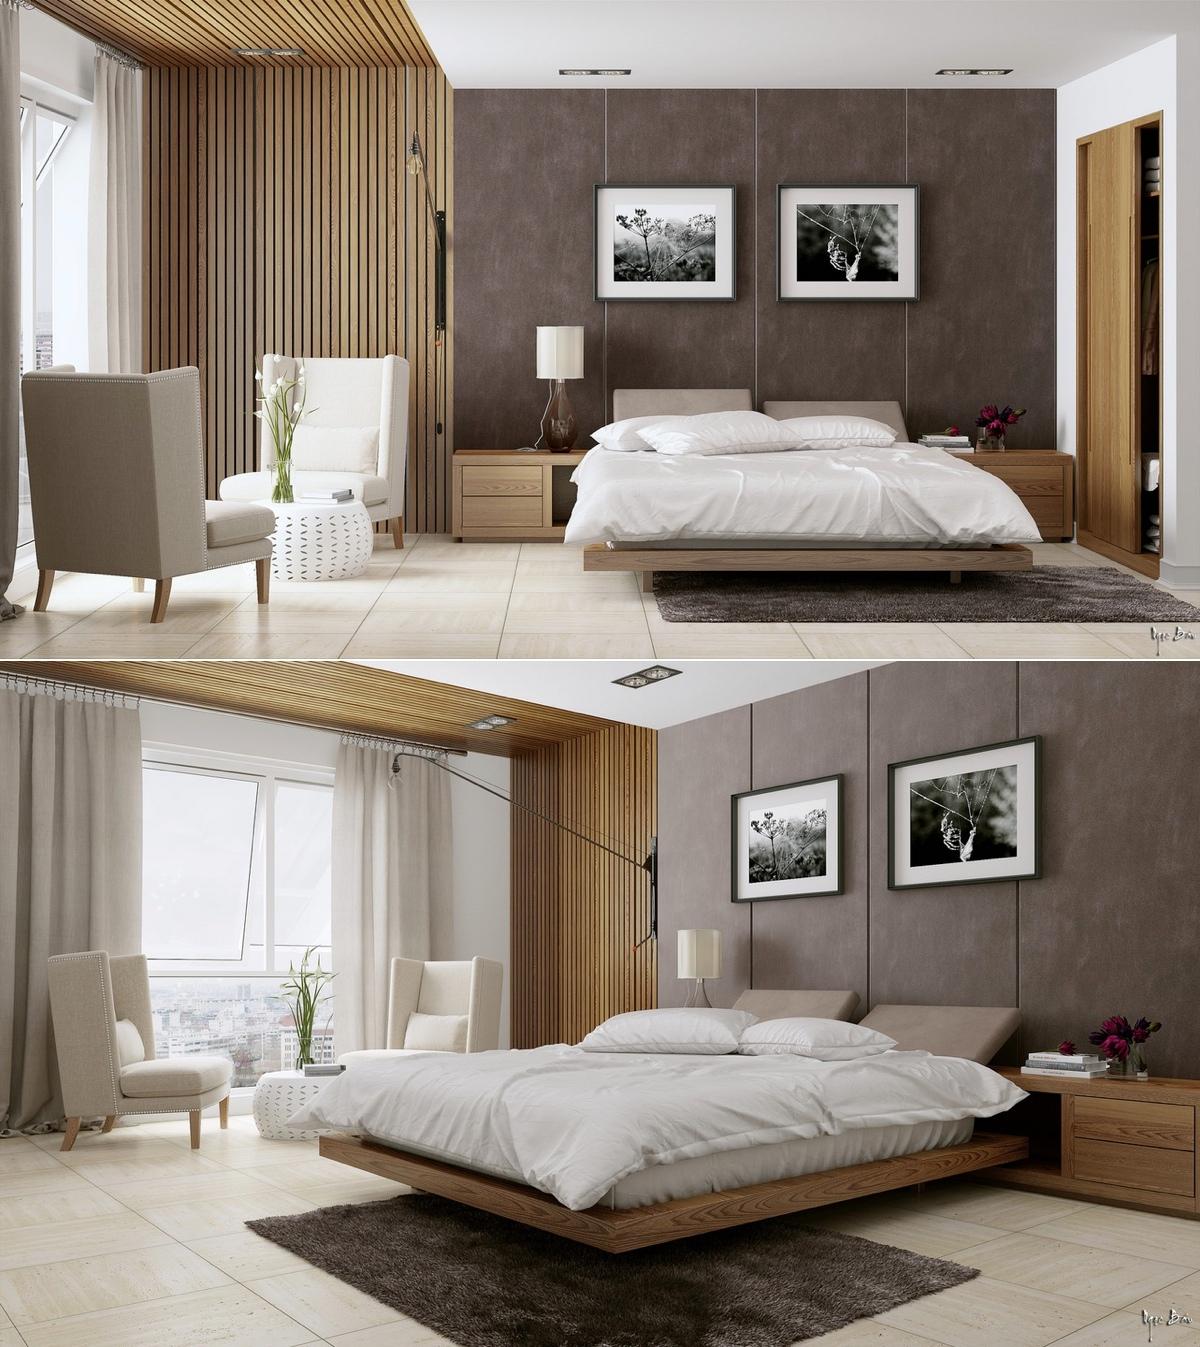 Bedroom Cupboards Brisbane Modern Romantic Bedroom Interior Purple Black And White Bedroom Korean Drama Bedroom Design: Modern Romantic Bedroom Ideas